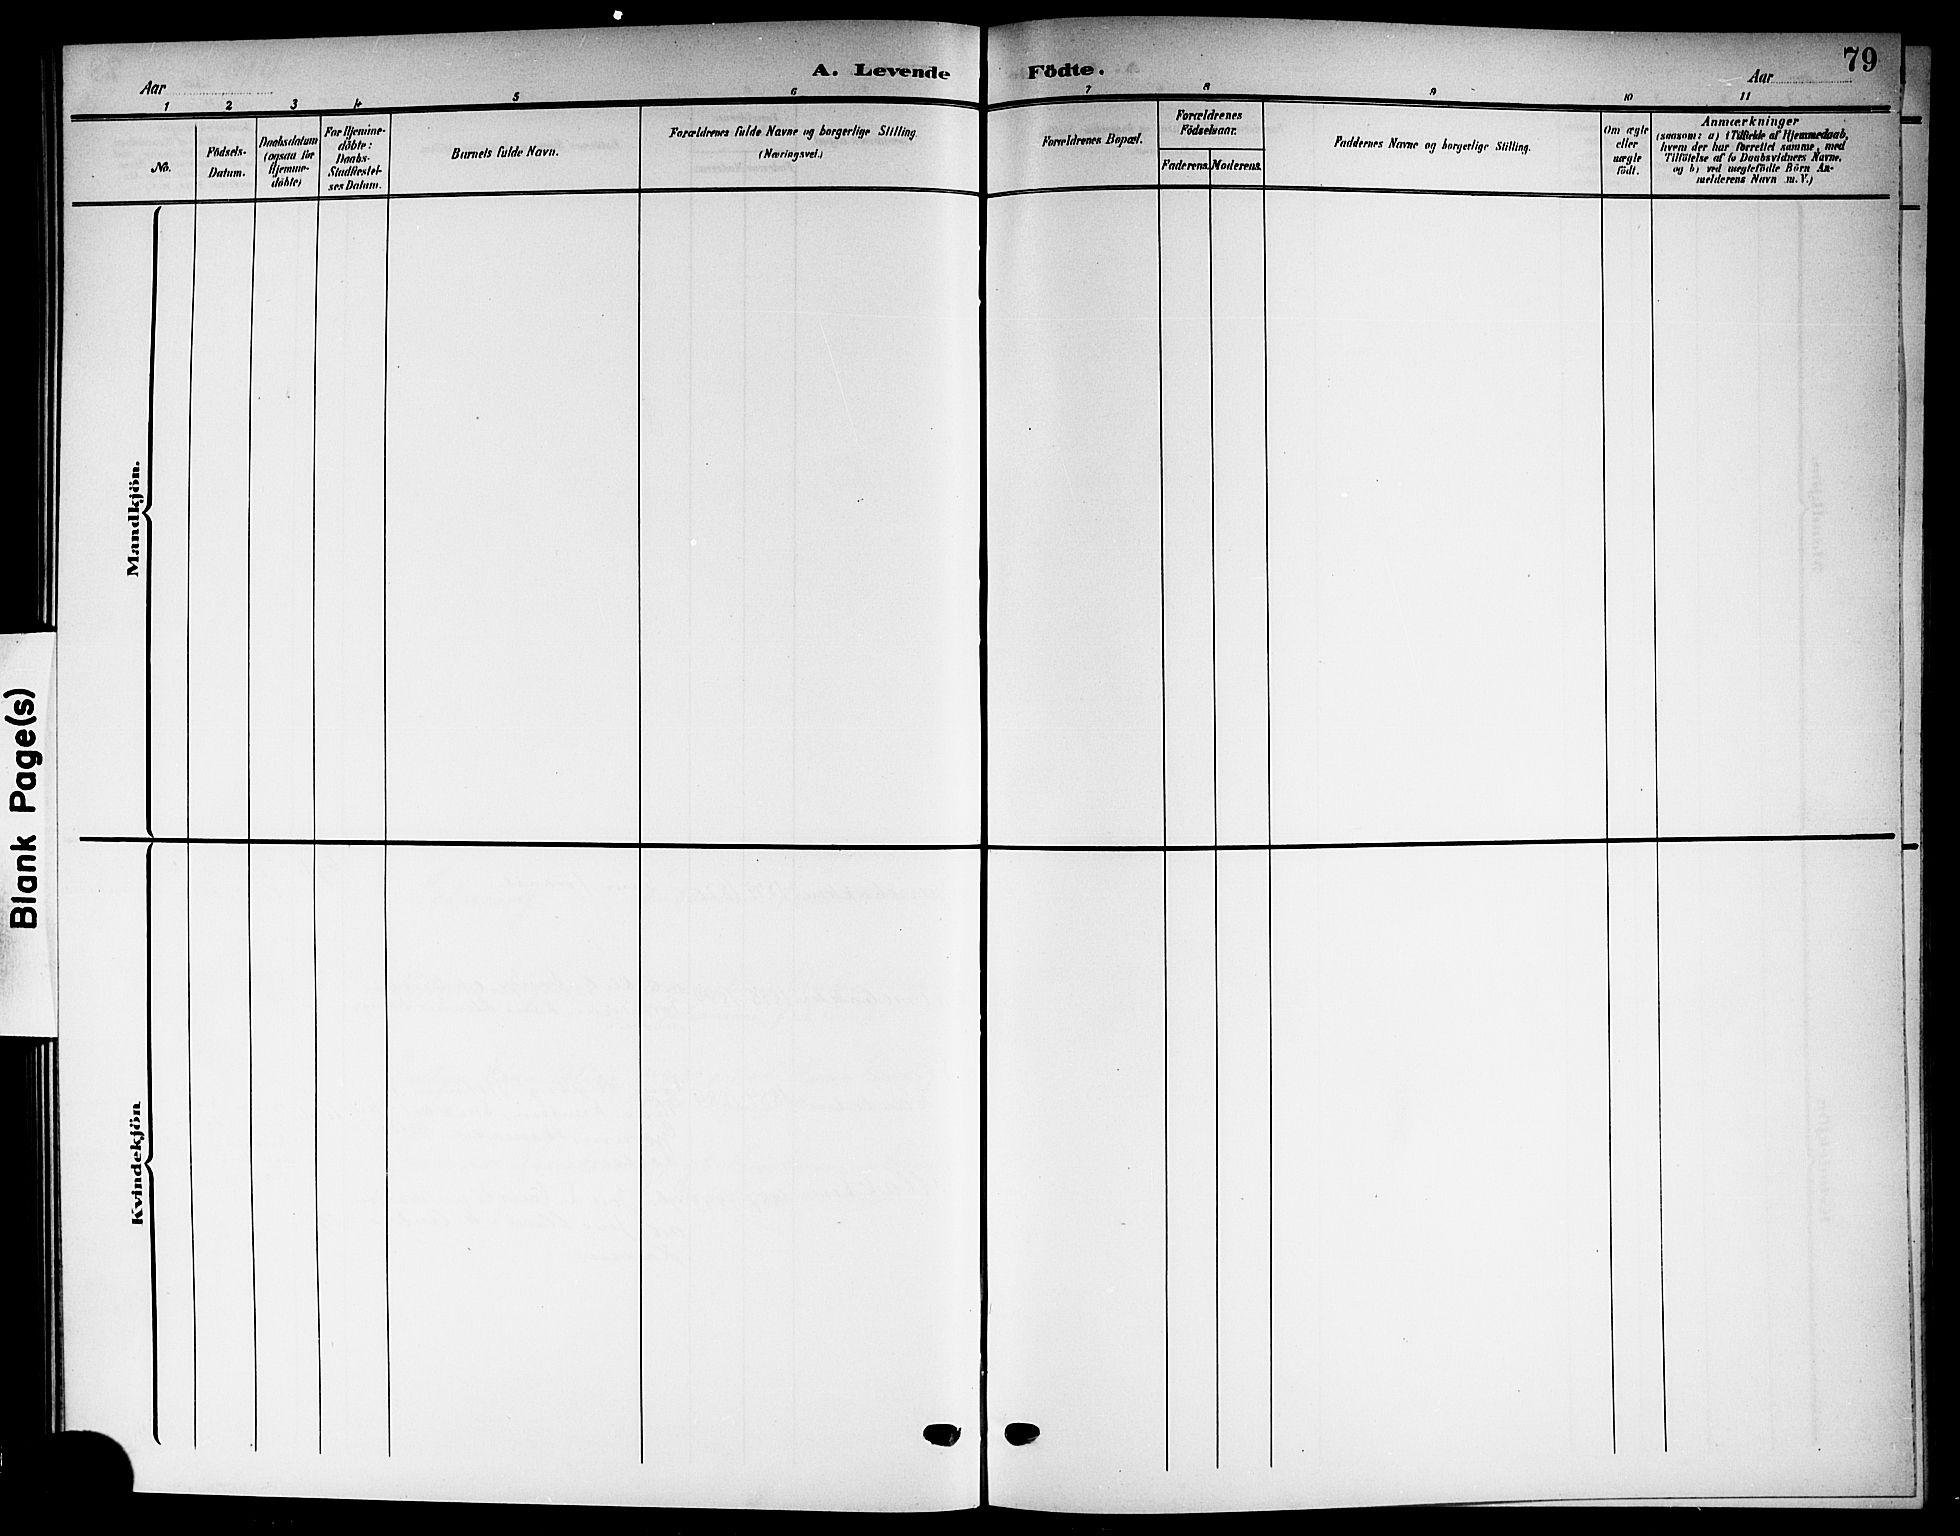 SAKO, Solum kirkebøker, G/Gb/L0005: Klokkerbok nr. II 5, 1905-1914, s. 79